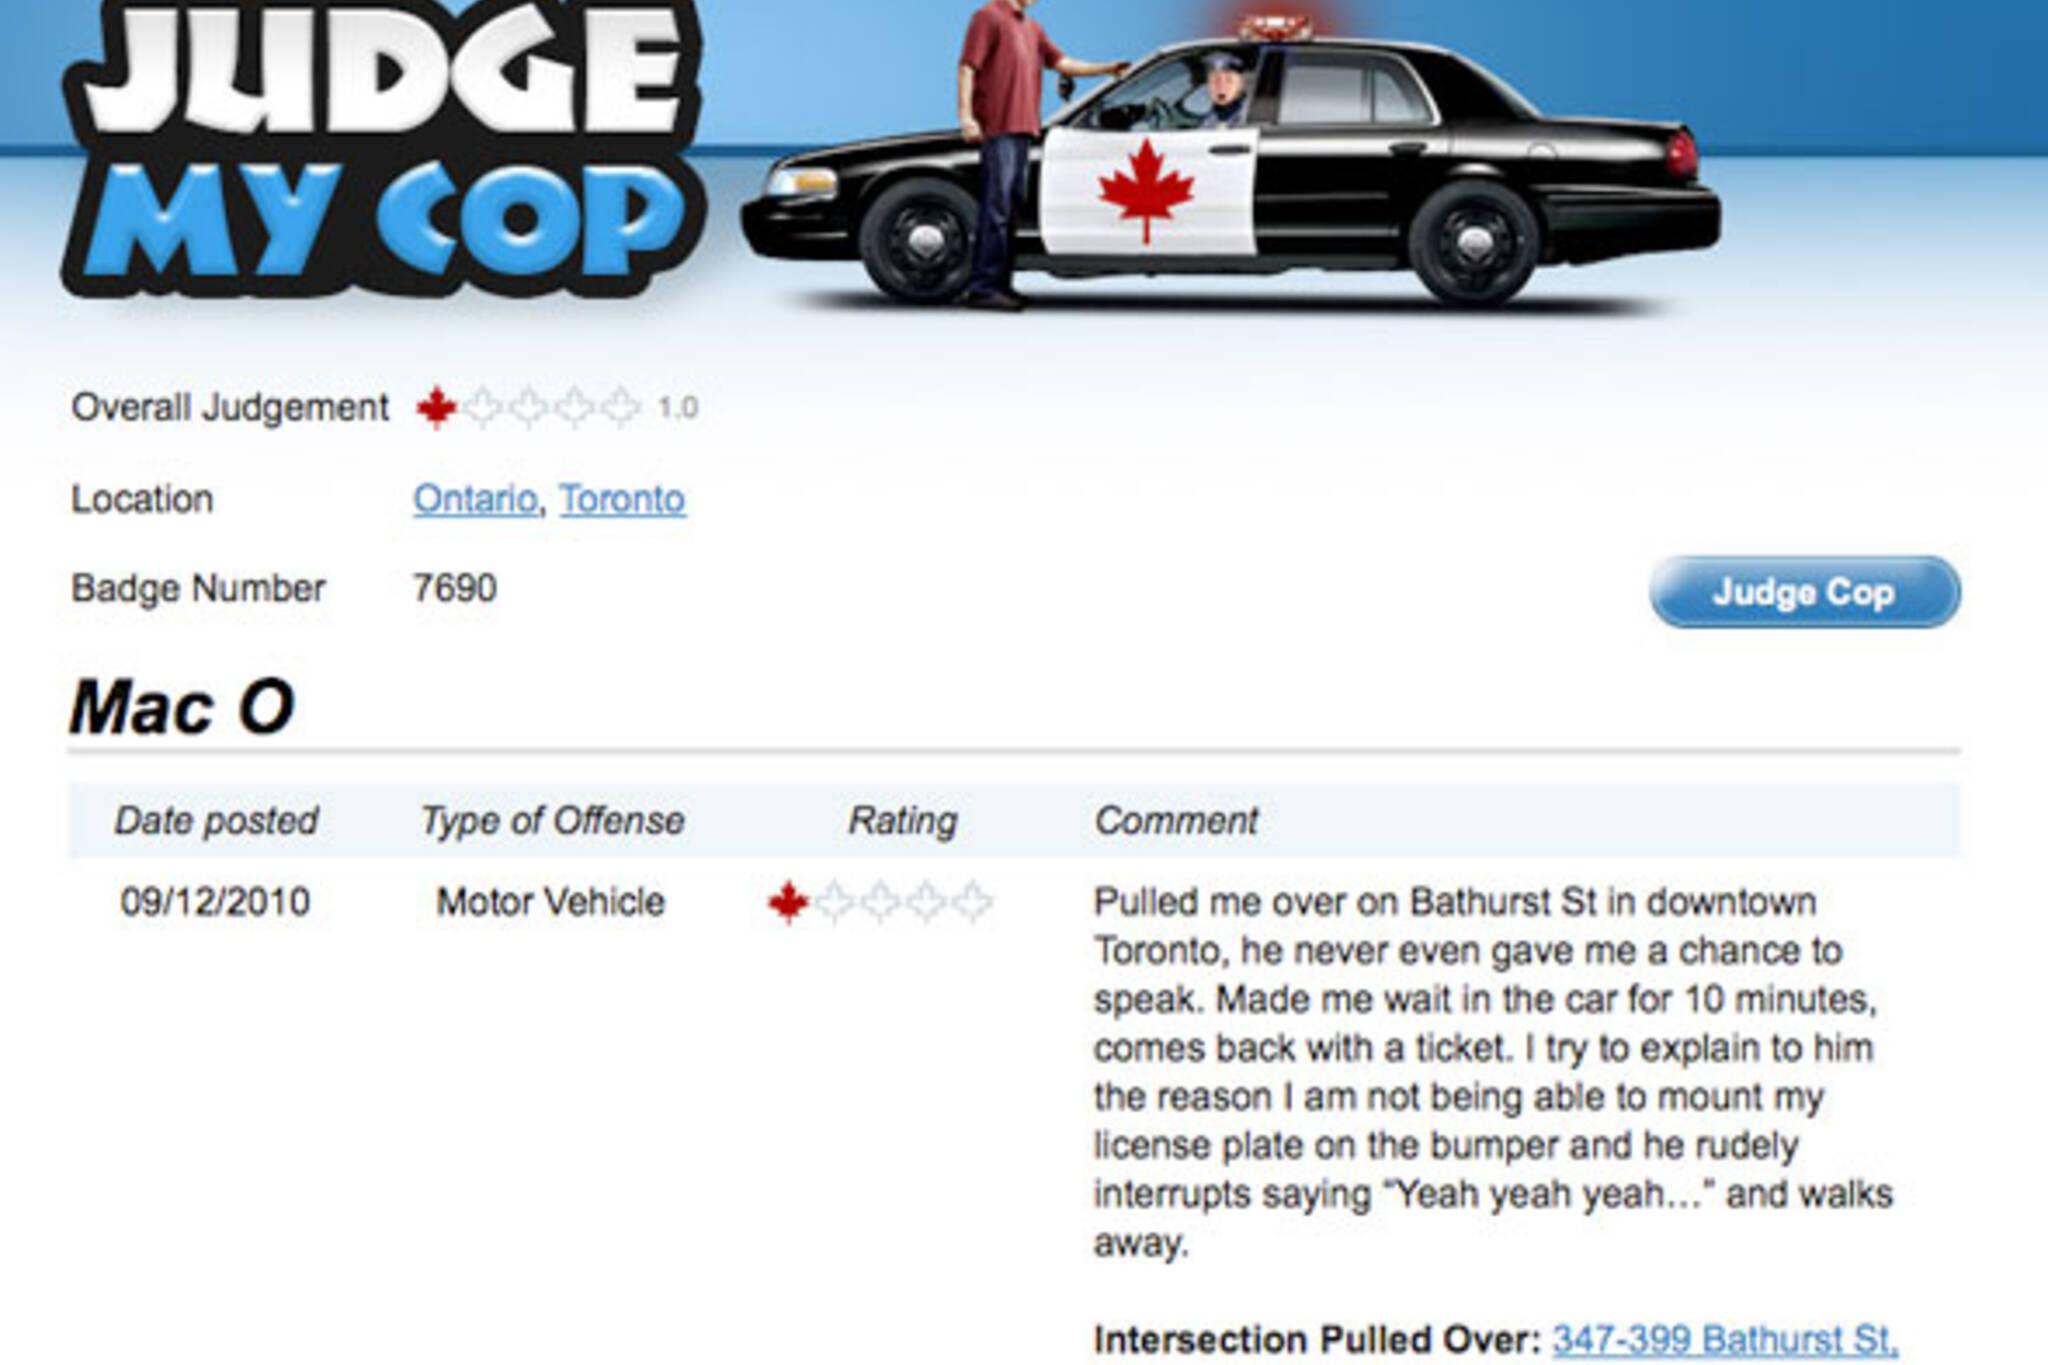 Judge my Cop